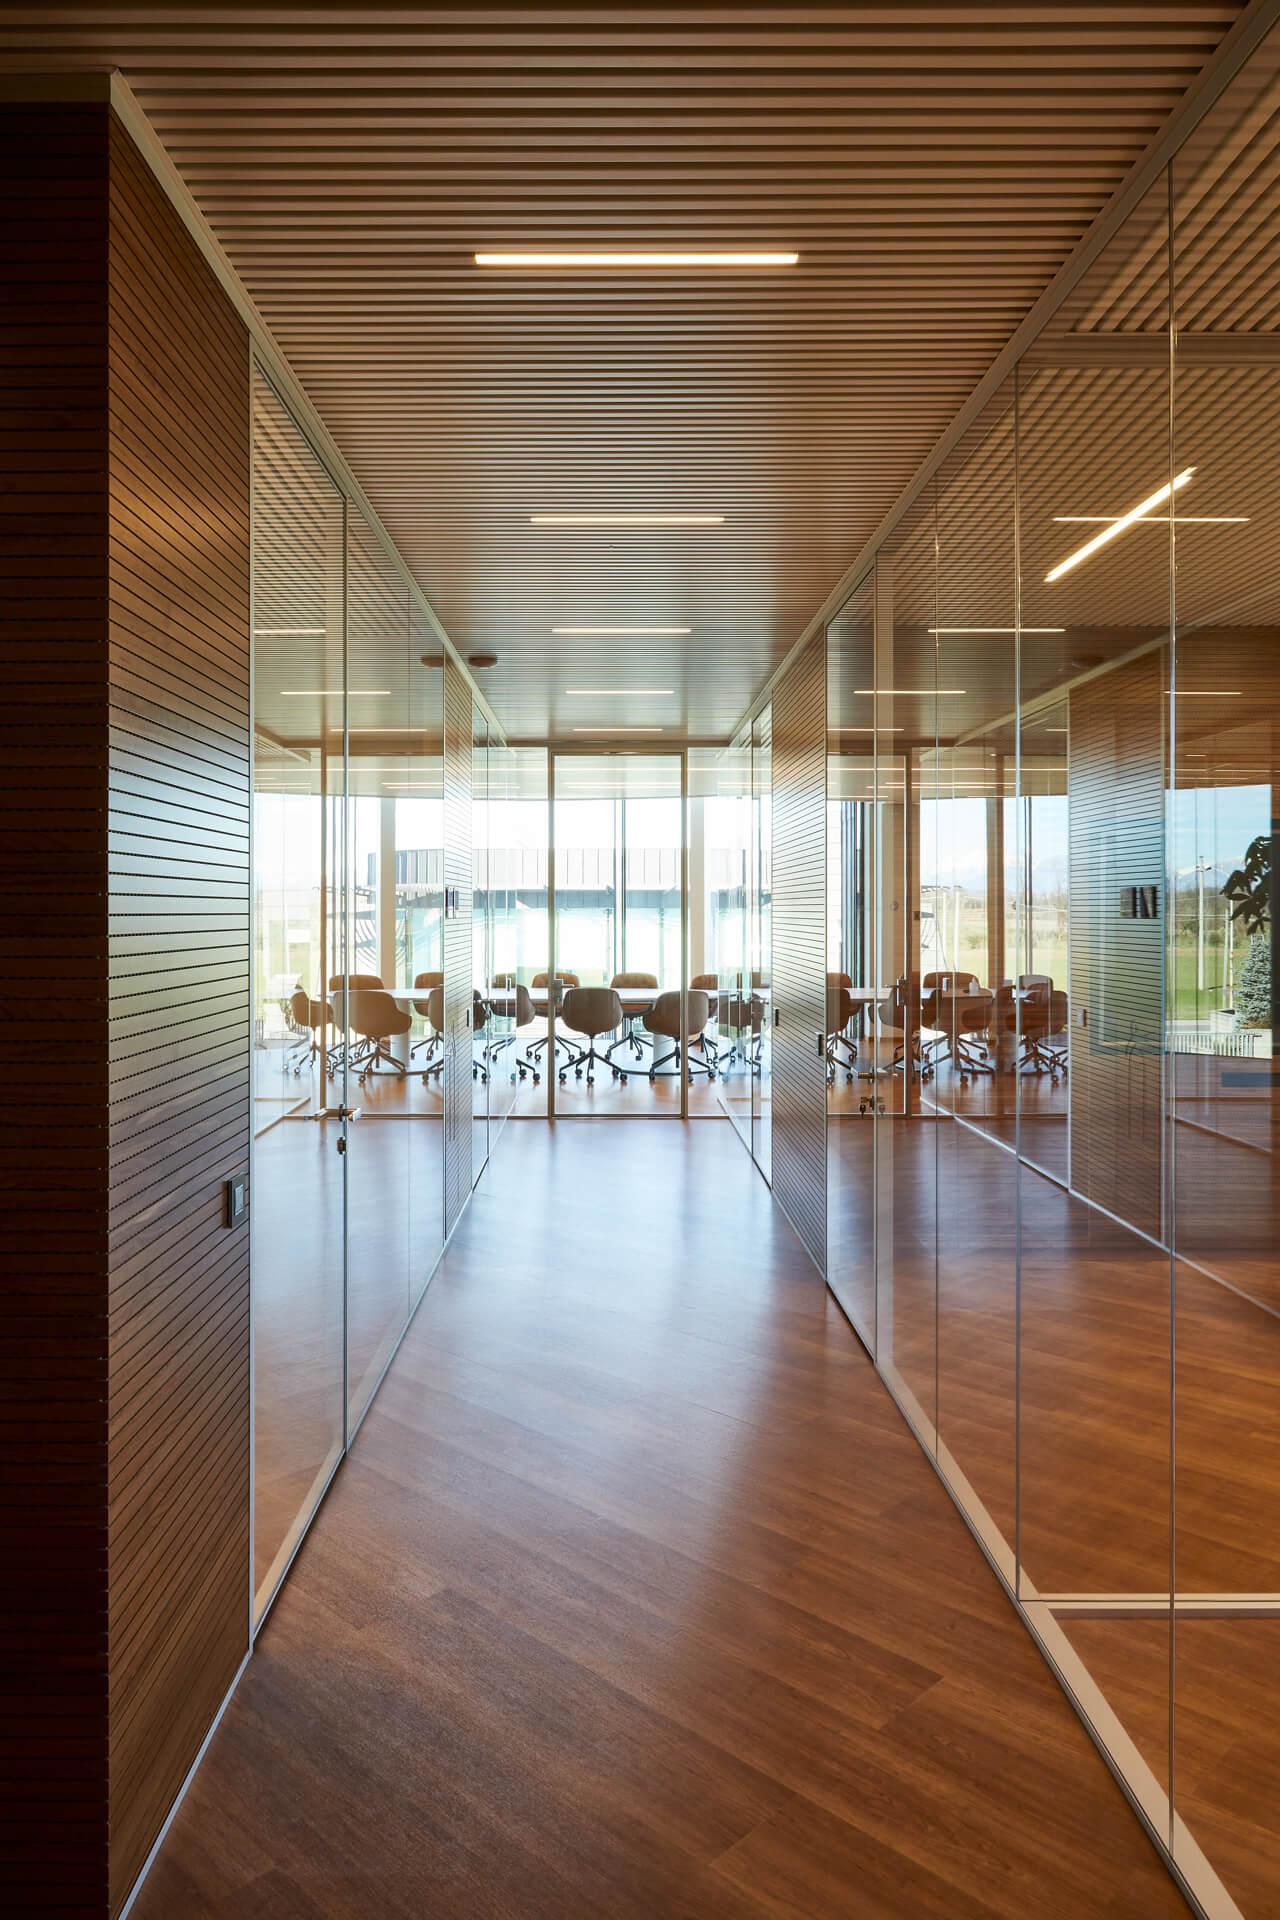 ak engineering - biofarma 1 - uffici operativi e meeting room Sonia De Boni